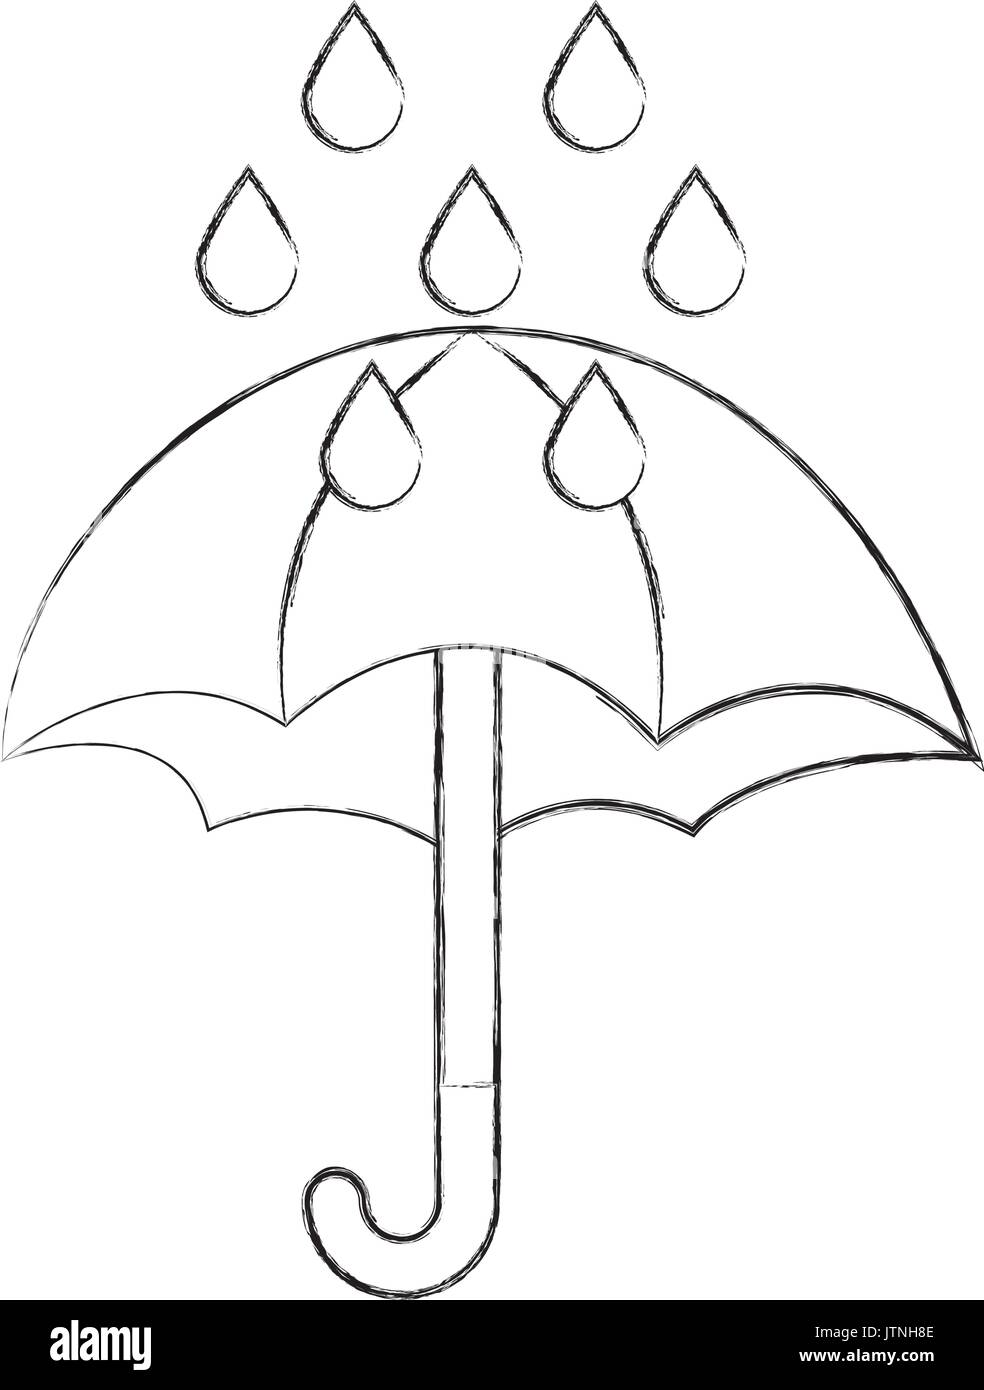 Lindo Paraguas Con Gotas De Lluvia Imagen Vector De Stock Alamy